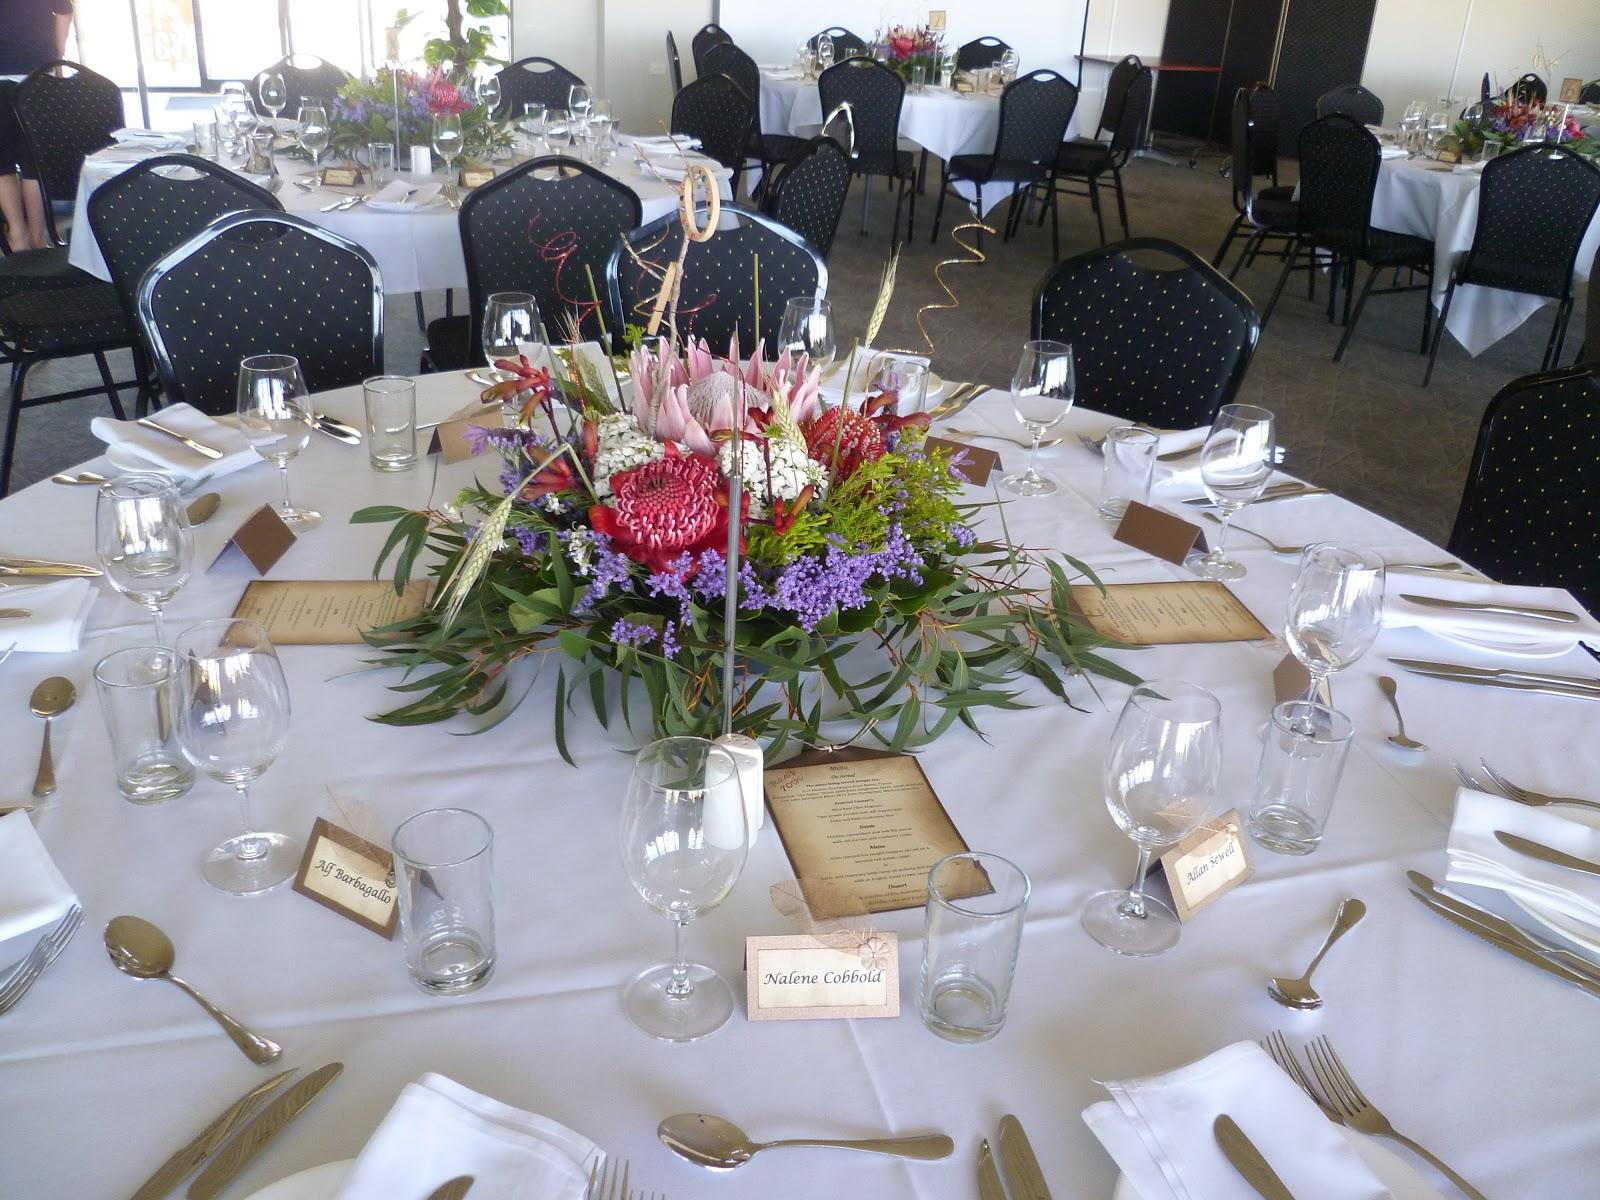 70th Birthday Table Decorations Ideas